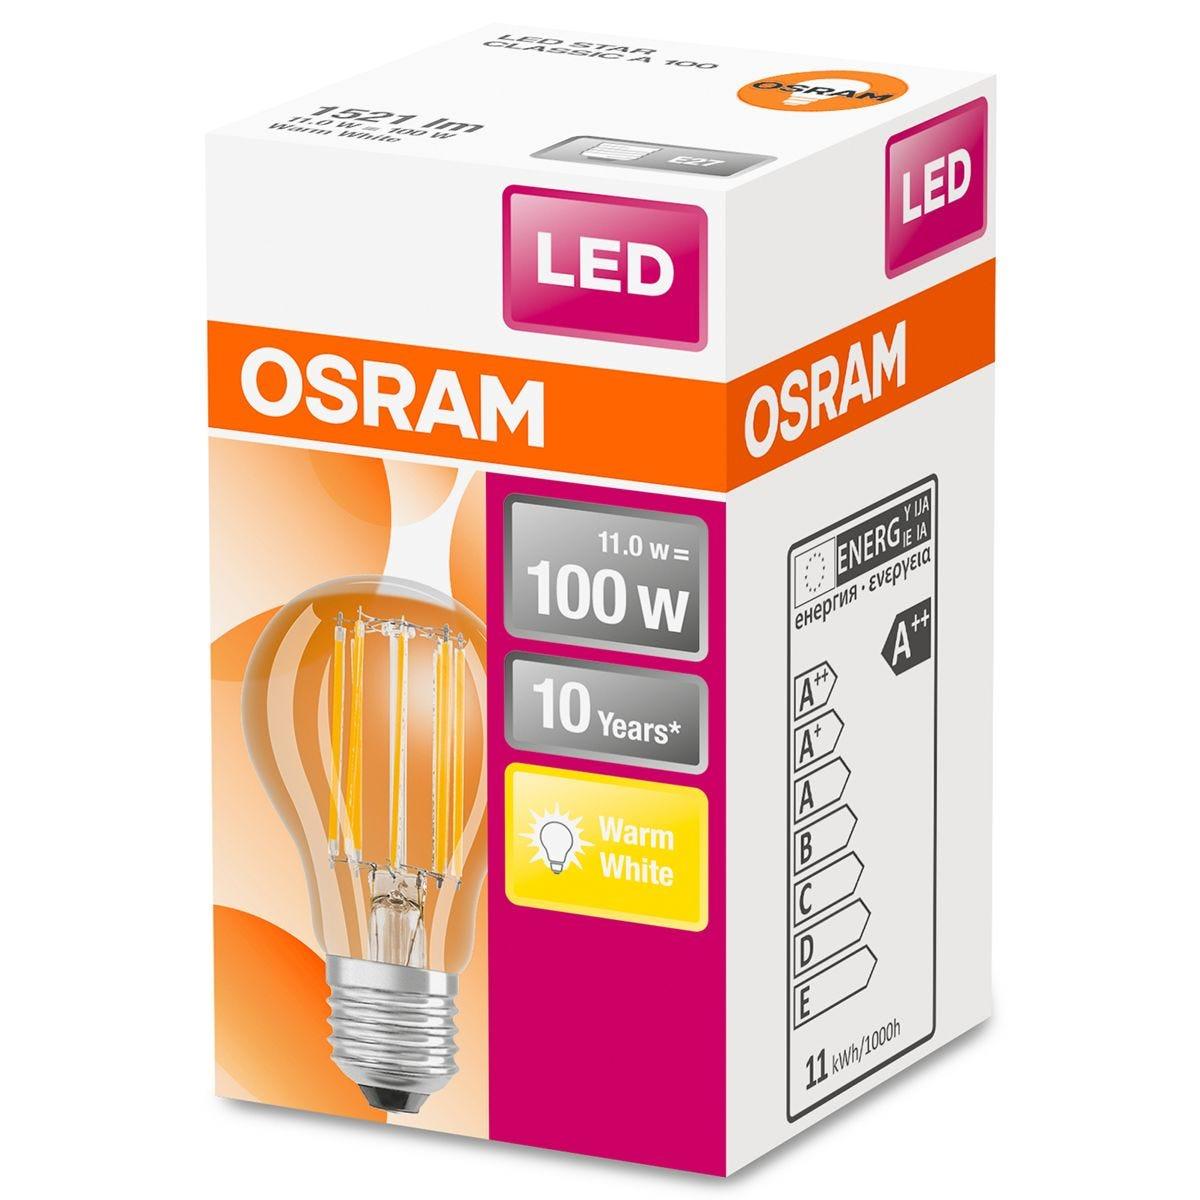 Osram Classic A 100W LED Filament Clear ES Bulb - Warm White